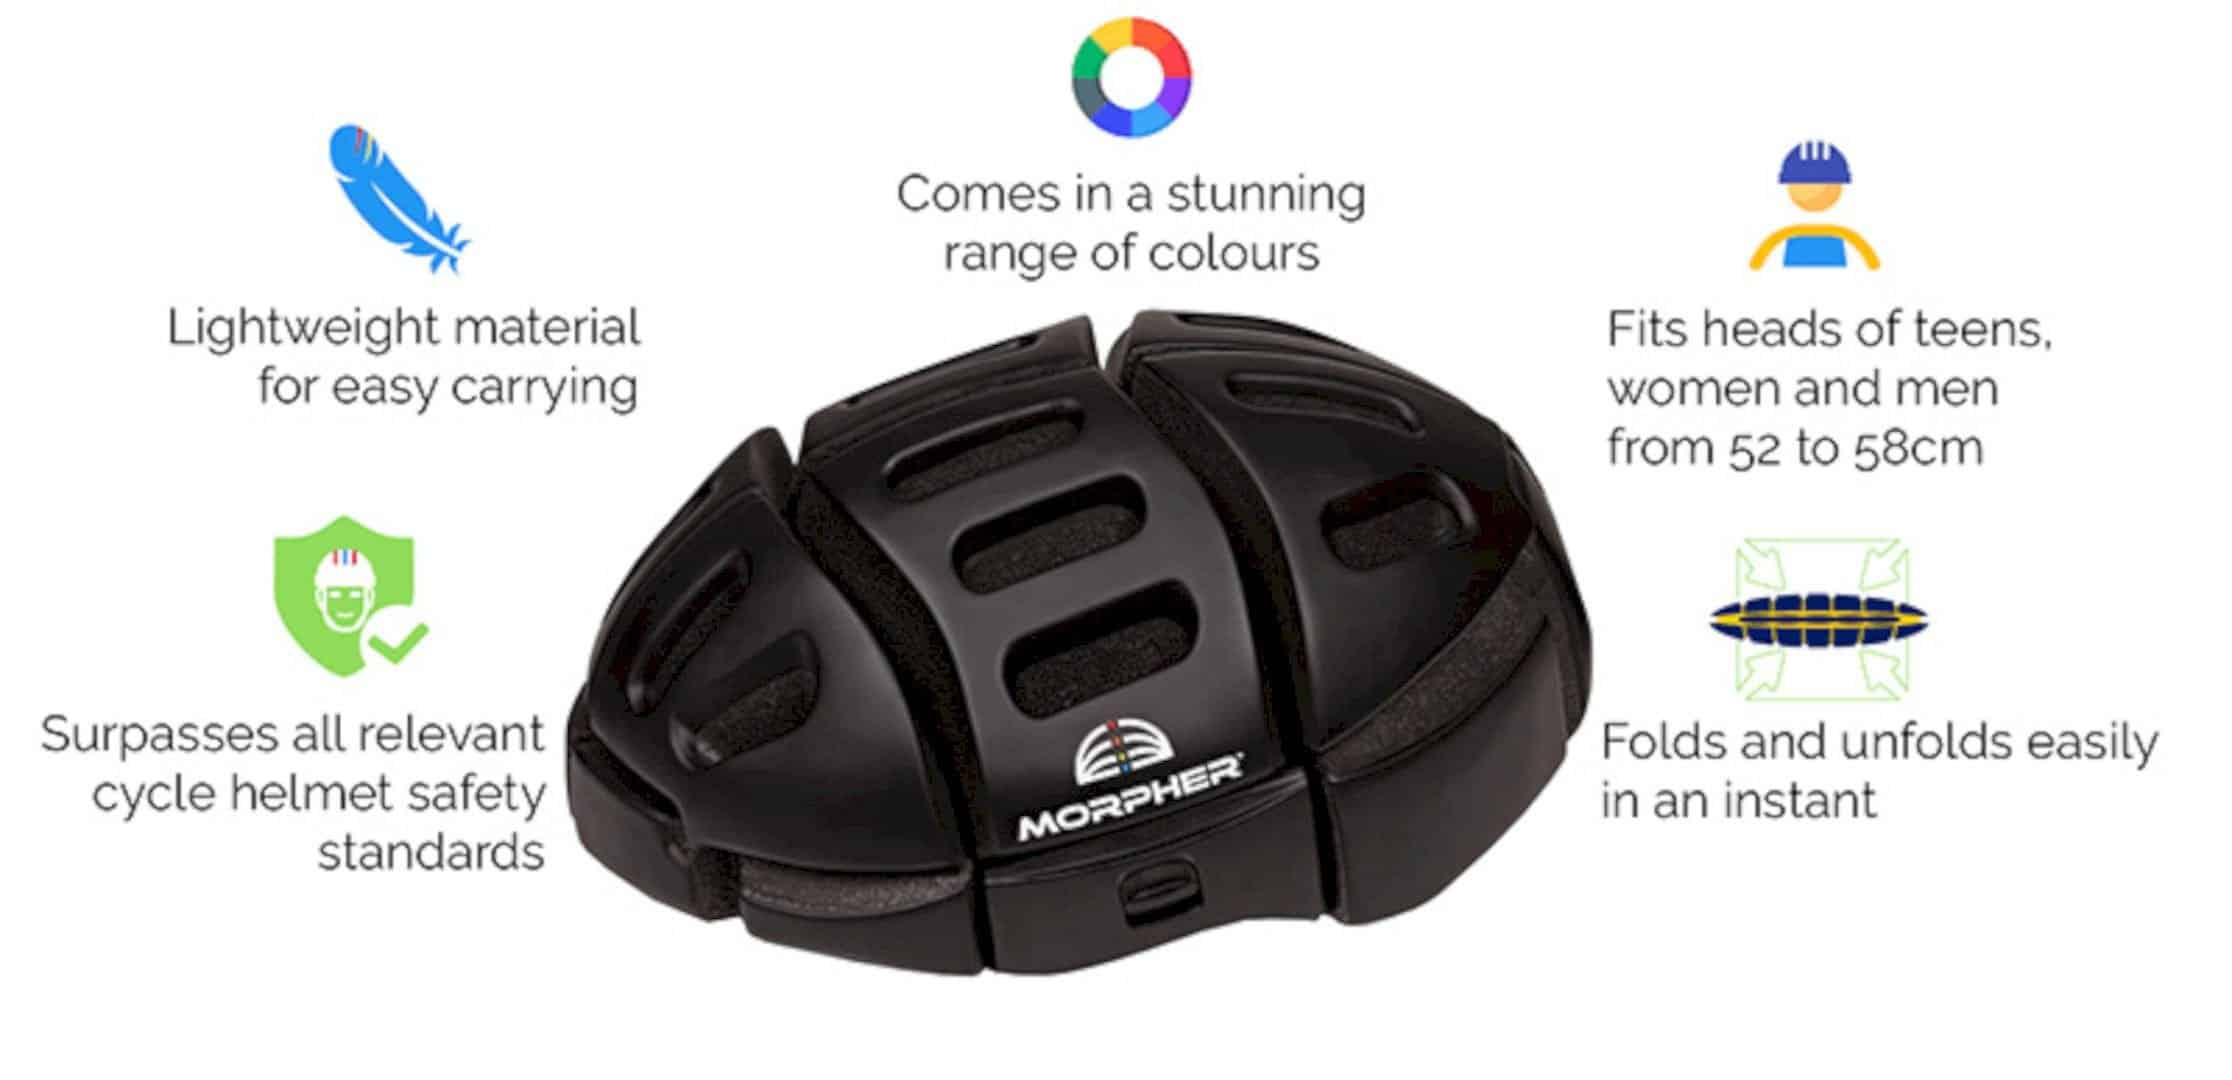 Morpher Helmet 7